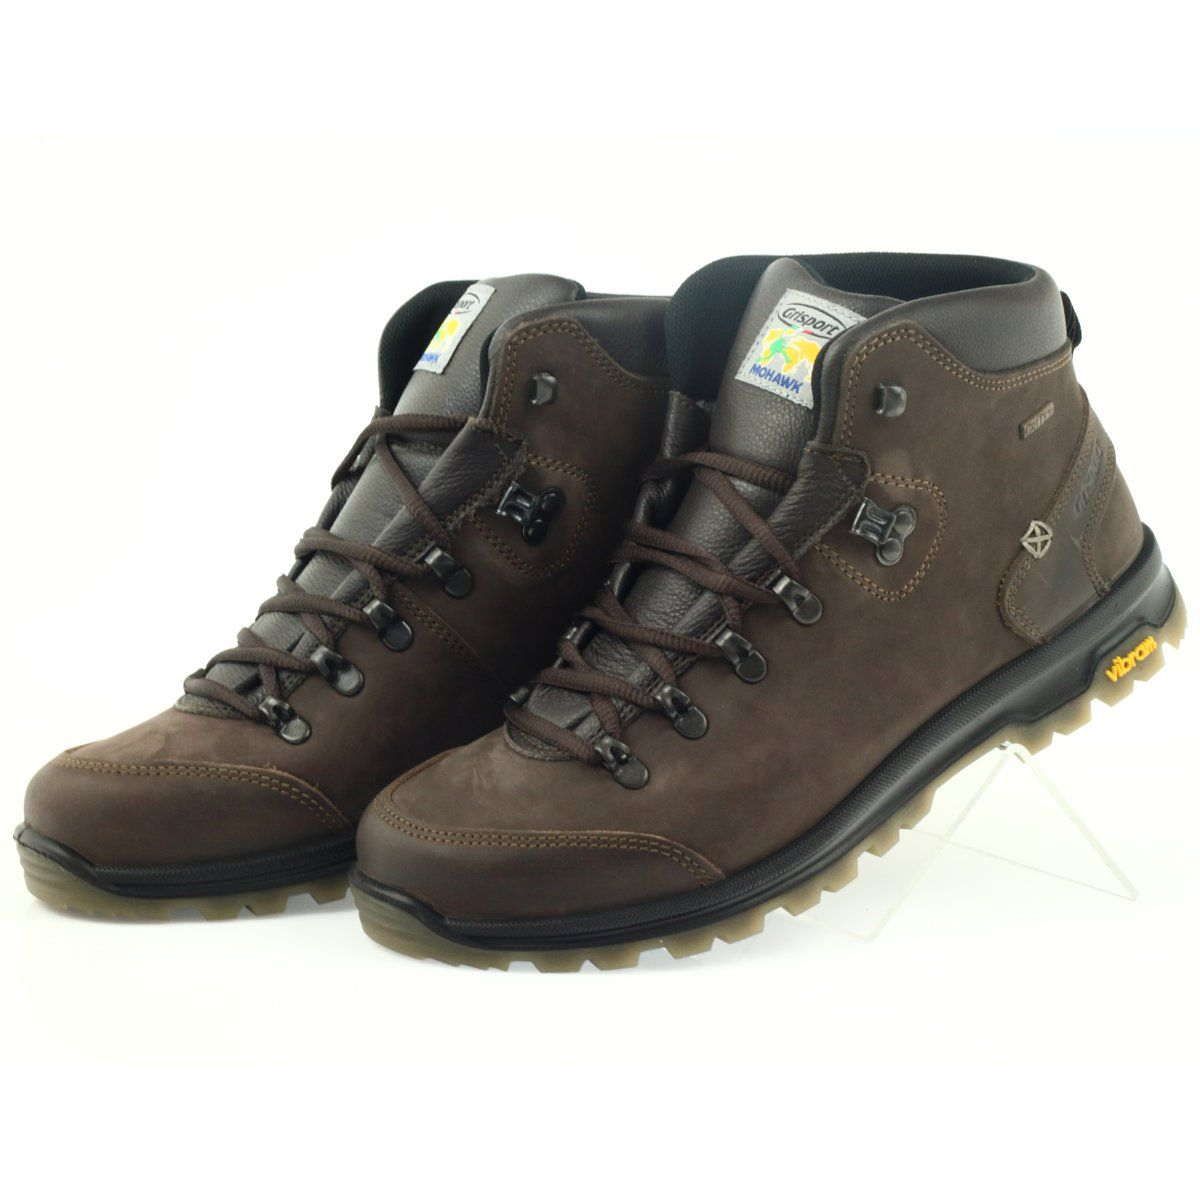 Grisport Brazowe Buty Trekkingowe Boots Danner Mountain Light Boot Hiking Boots